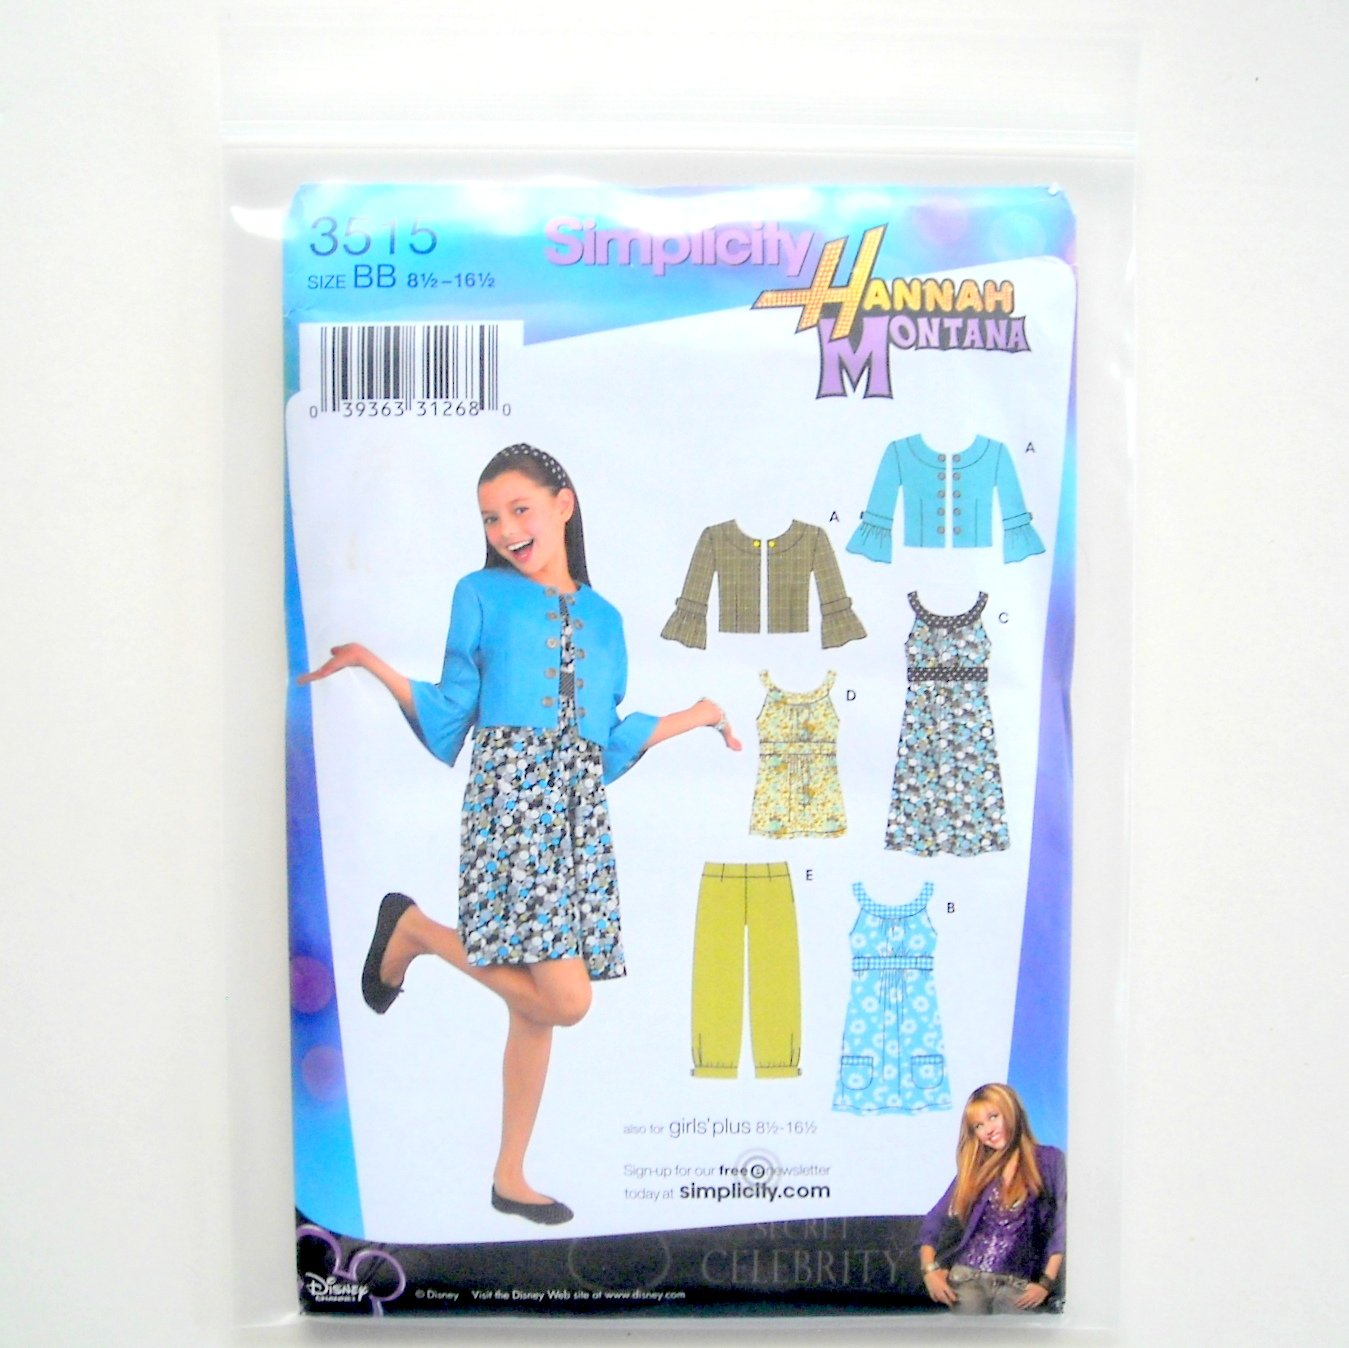 Girl Plus Jacket Pants Dress Disney Hannah Montana 8.5 - 16.5 Simplicity Sewing Pattern 3515